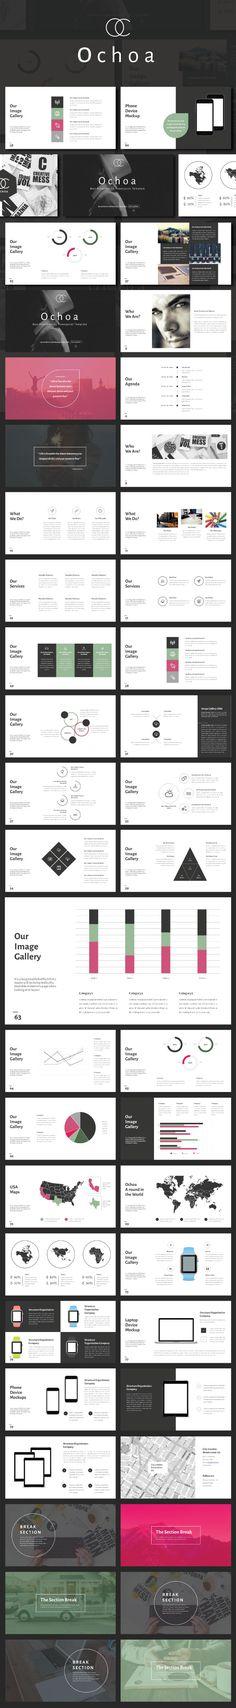 Ochoa Minimal Powerpoint Template • Download ➝ https://graphicriver.net/item/ochoa-minimal-presentation-template/17103320?ref=pxcr